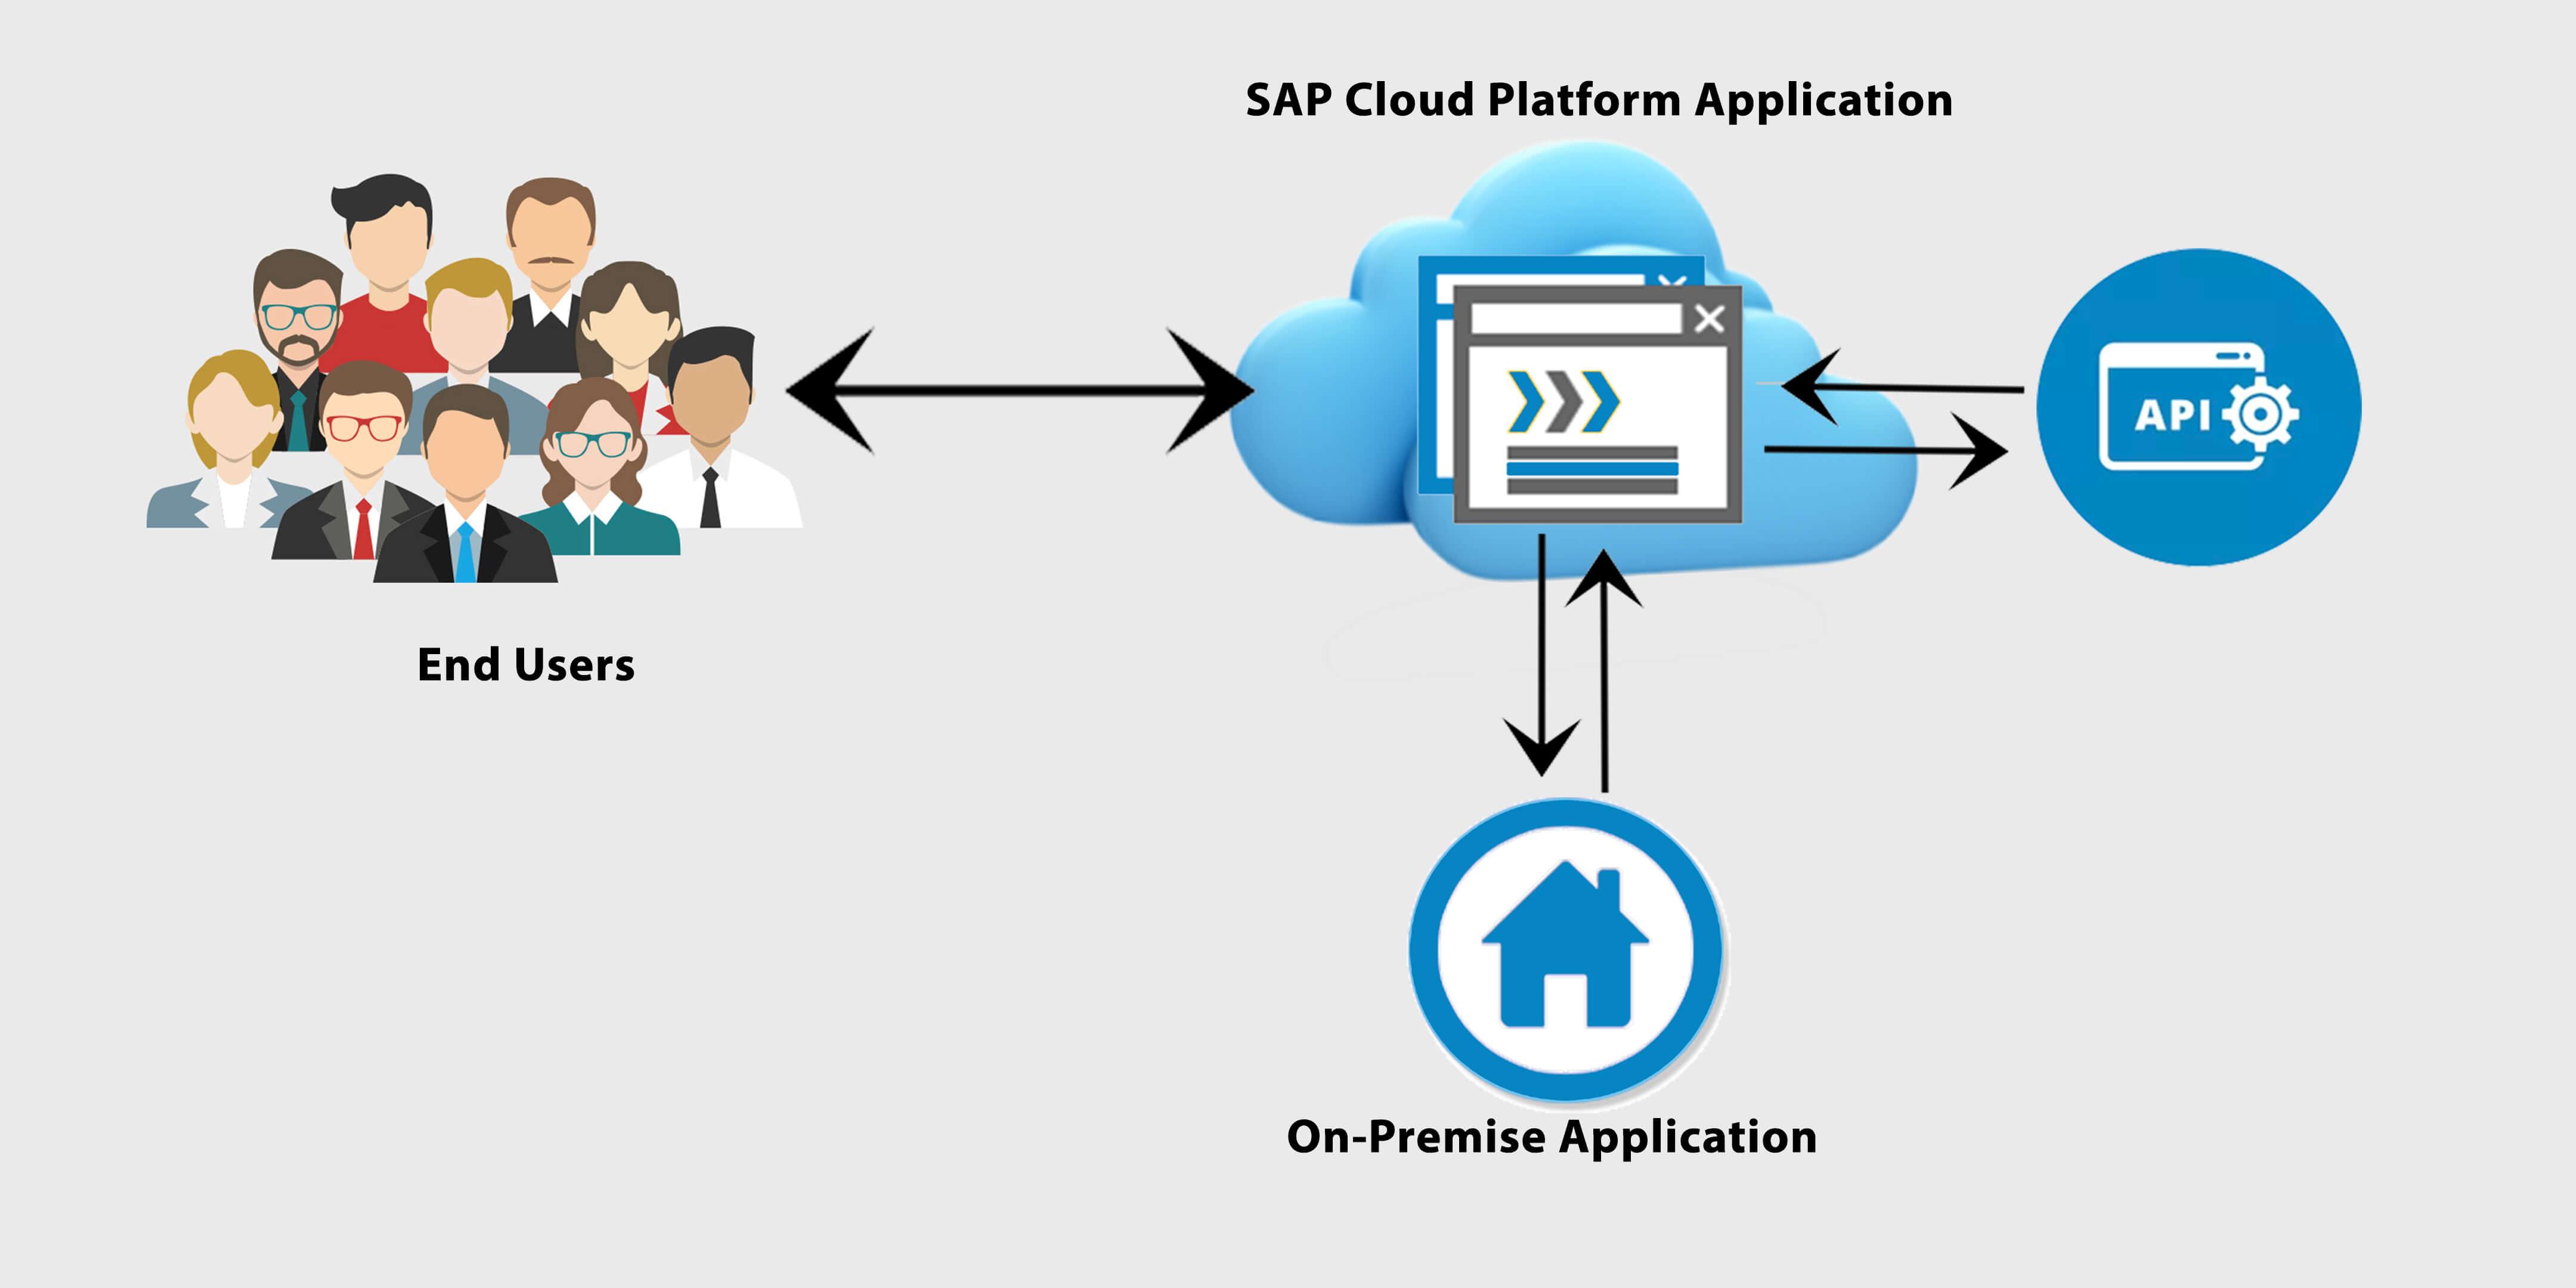 Fiori 10 Exercises.Extend Sap Cloud Platform Fiori Applications With Pre Built Code